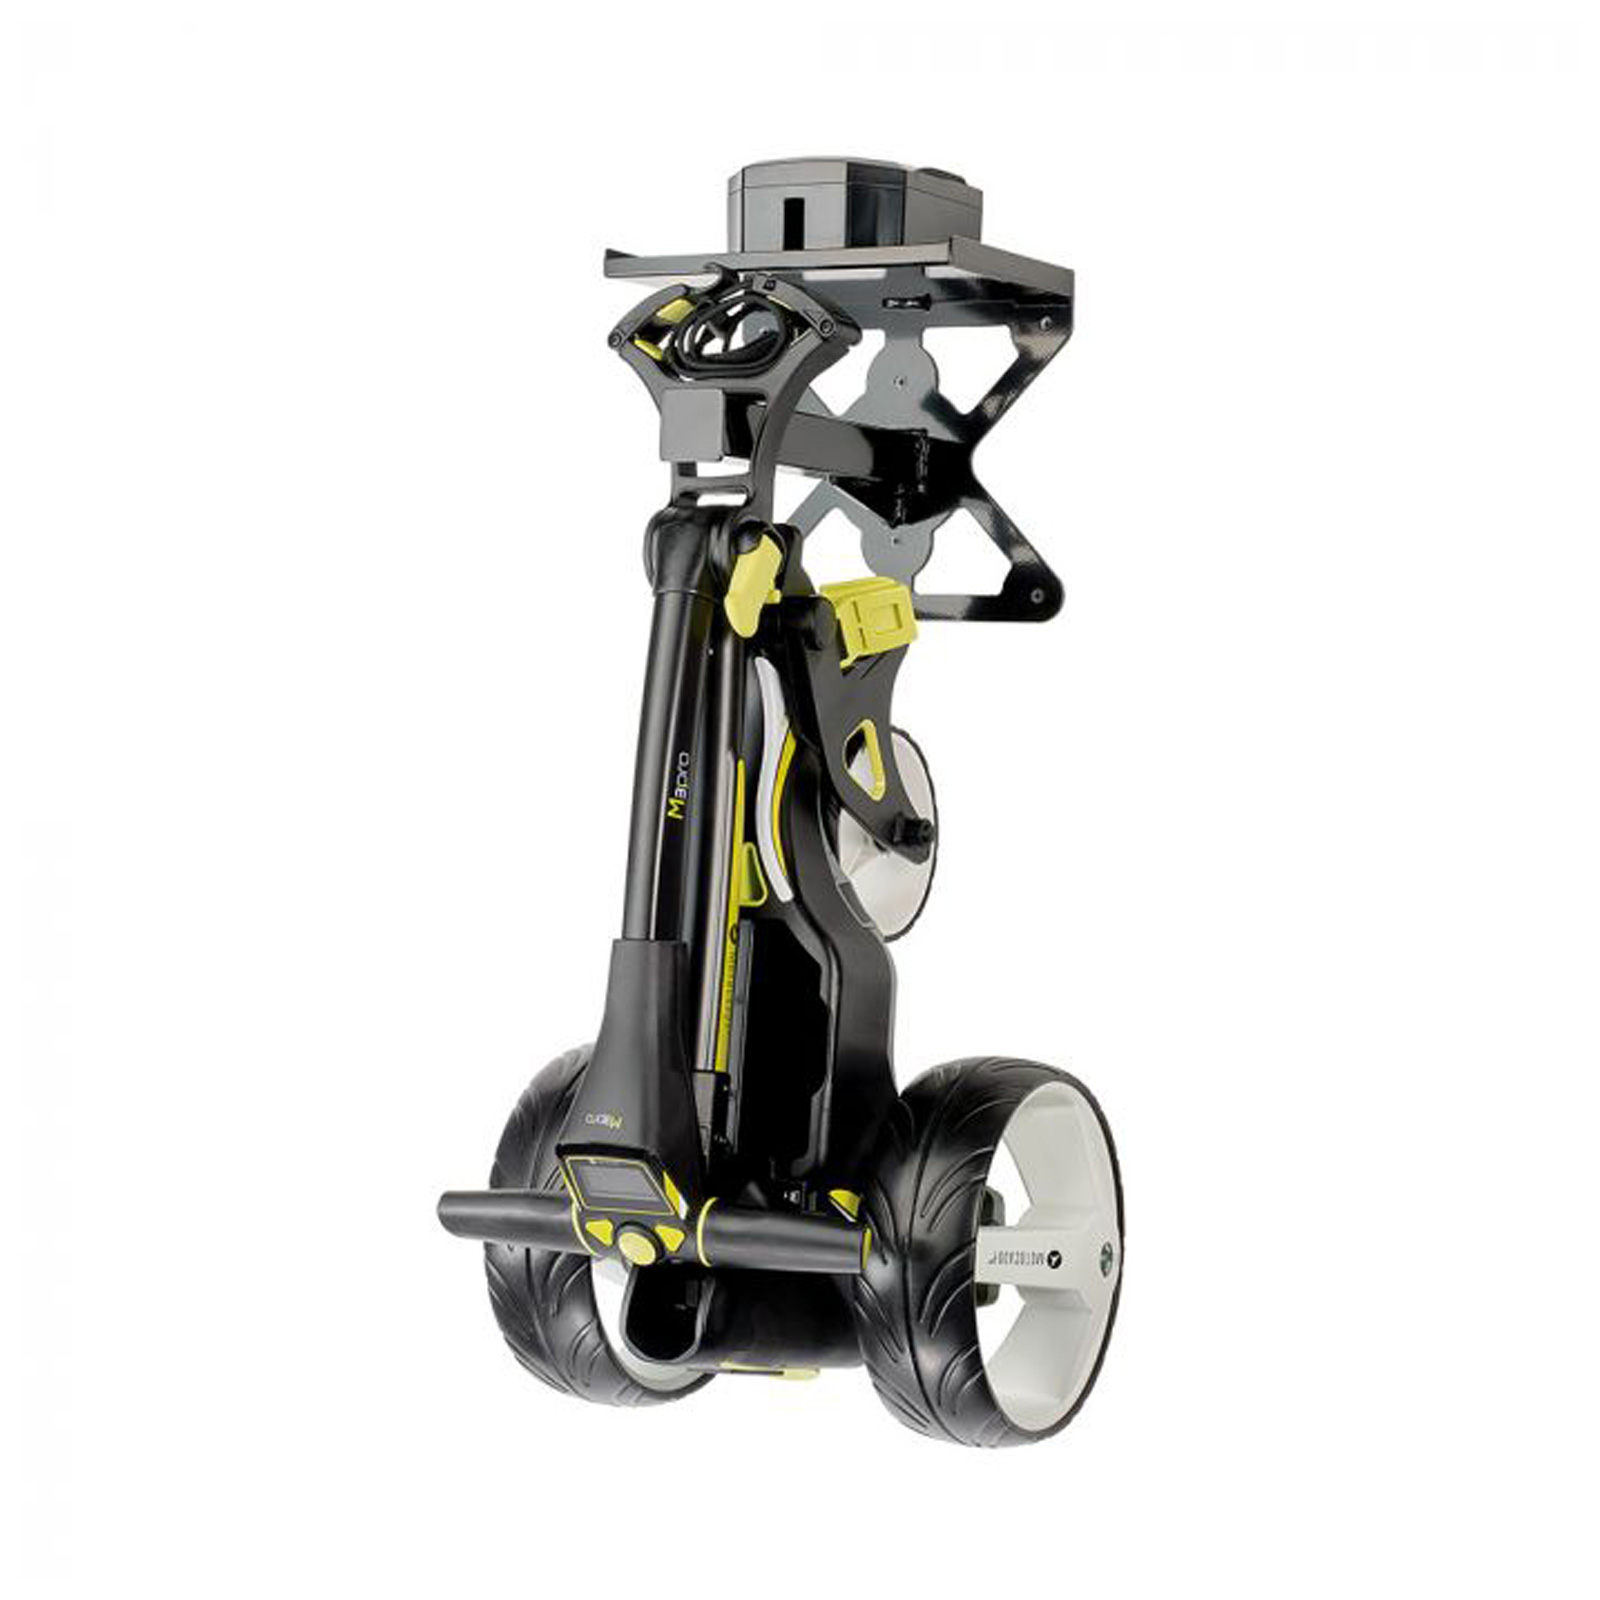 Motocaddy-Golf-Trolley-Accessories-Electric-Push-Pull-Cart-Genuine-Add-Ons miniatuur 19